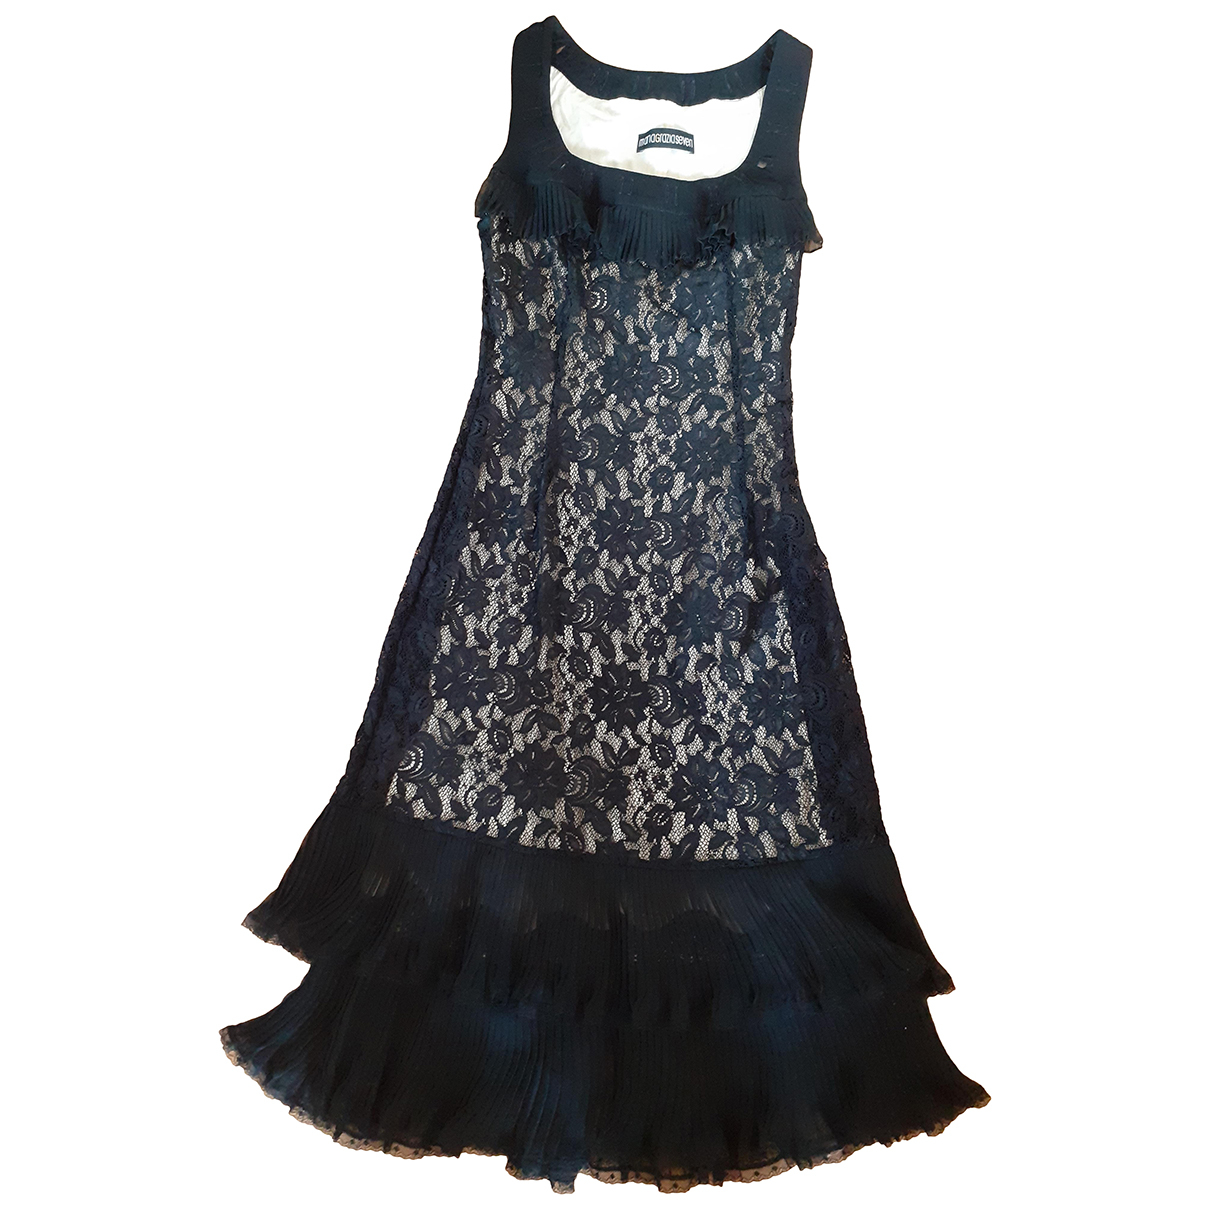 Maria Grazia Severi \N Kleid in  Schwarz Seide